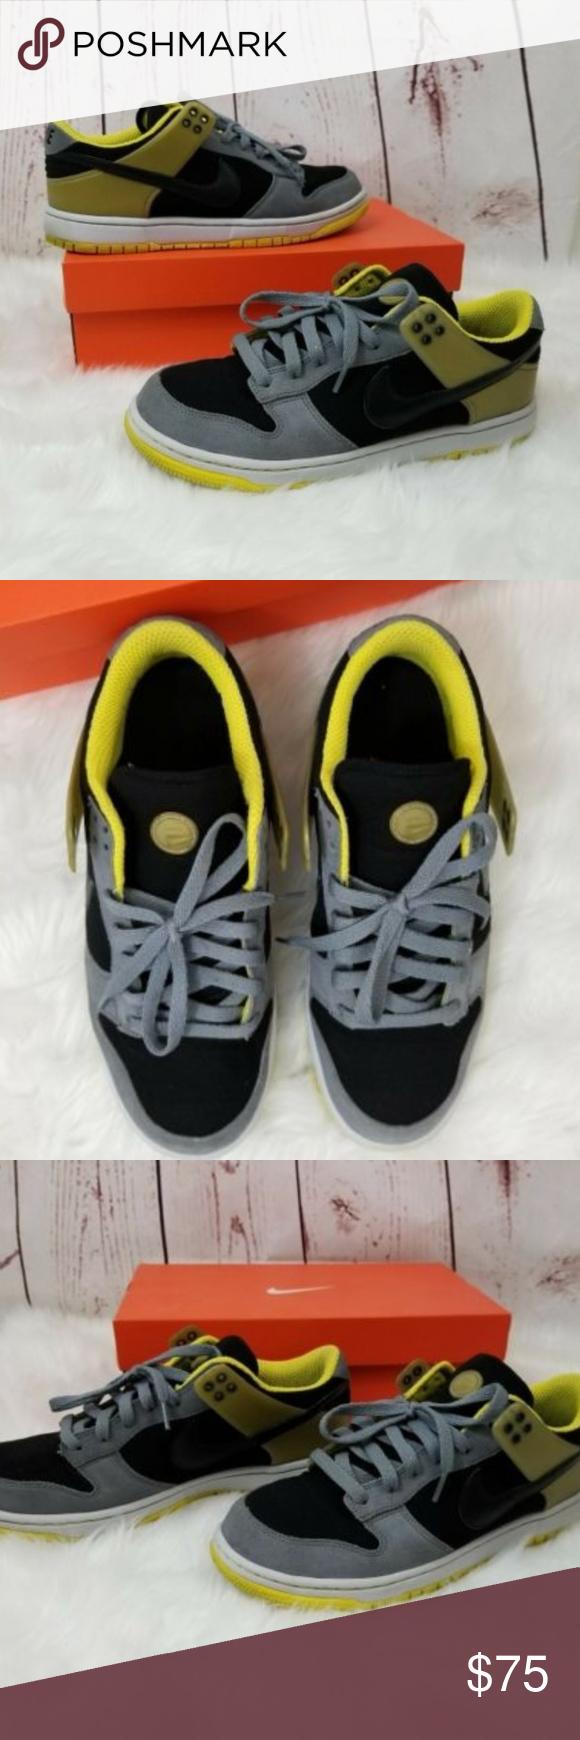 NIKE Air Zoom Dunkesto Men's Size 10 Black Yellow Air Zoom Dunkesto Shoes  in Black and